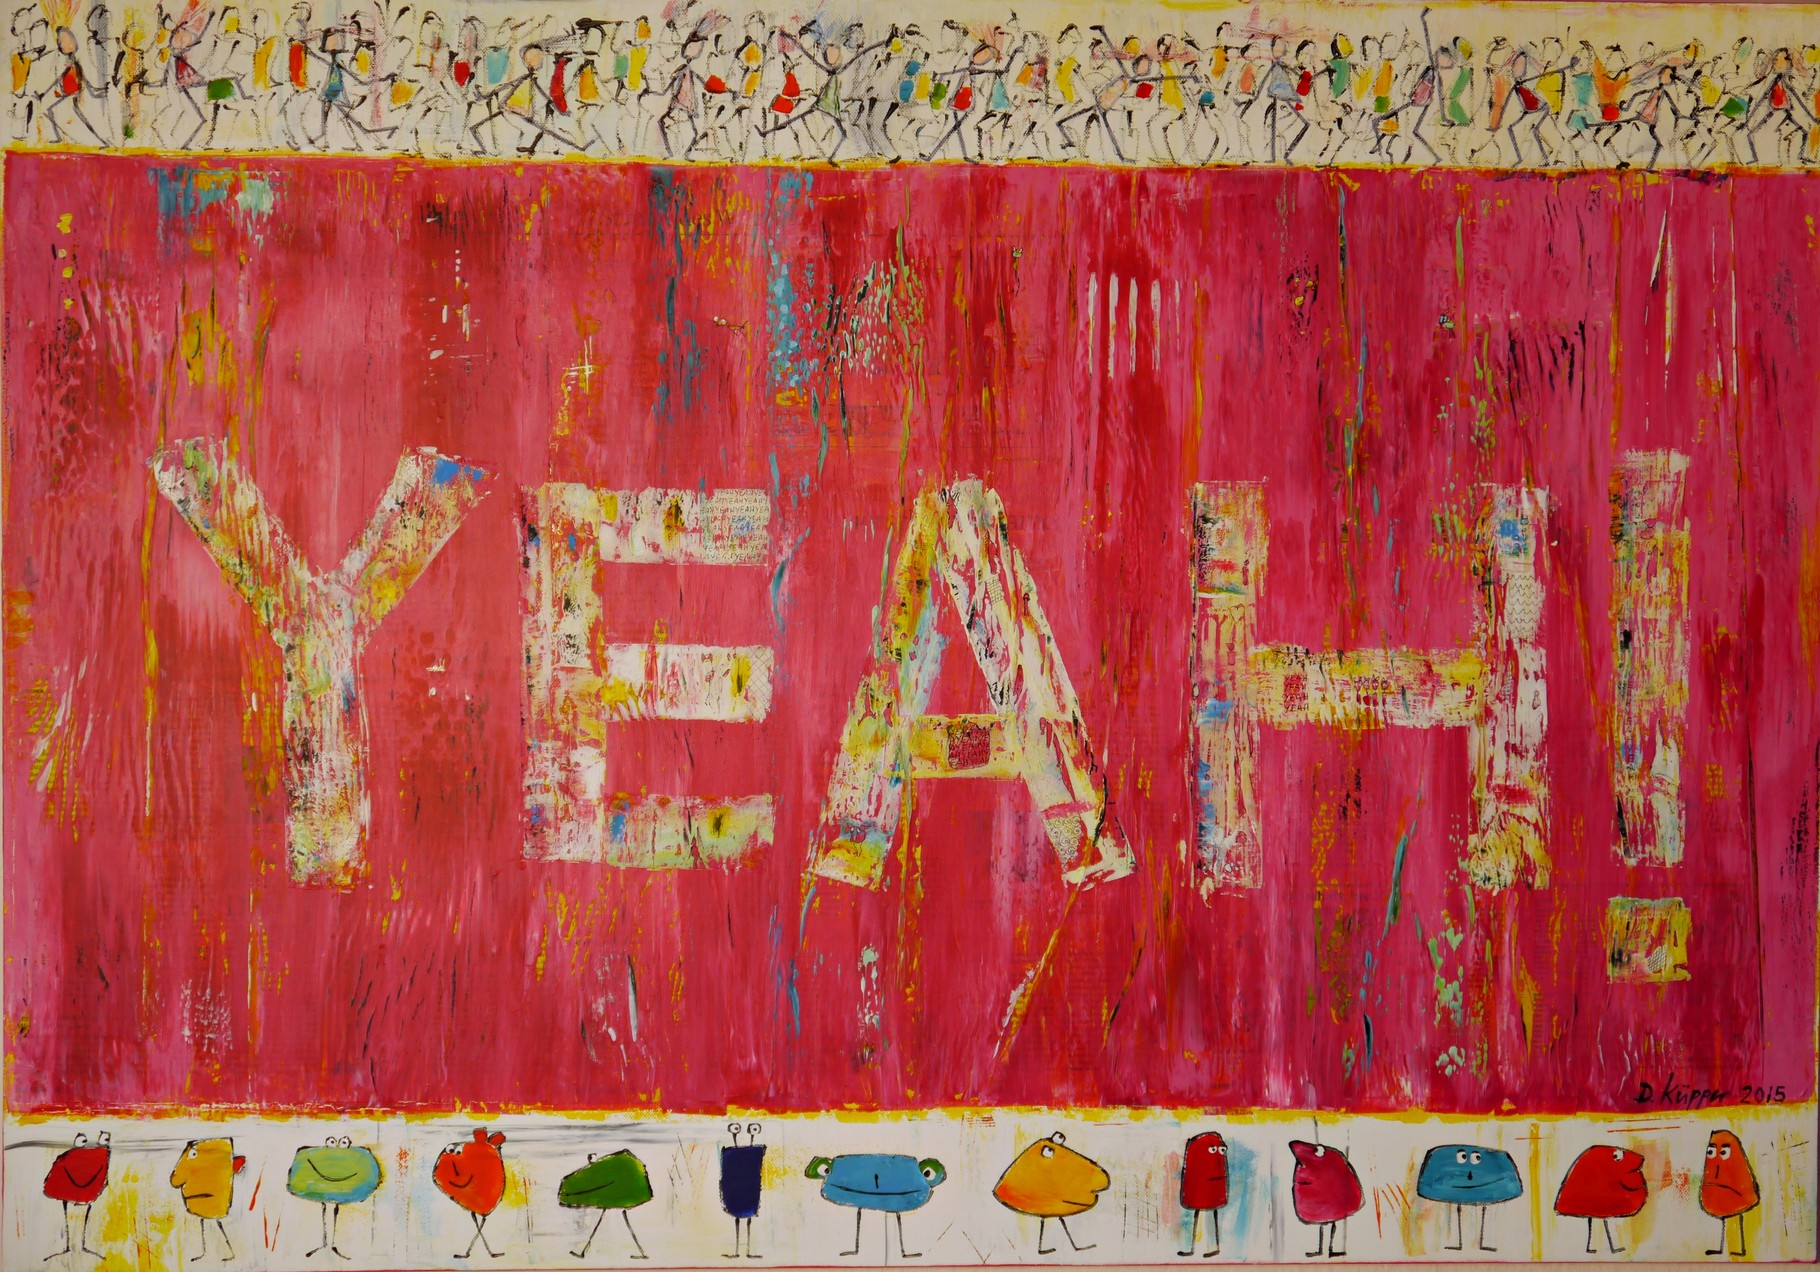 """YEAH"" - 100x70cm - Preis: 320 Euro"